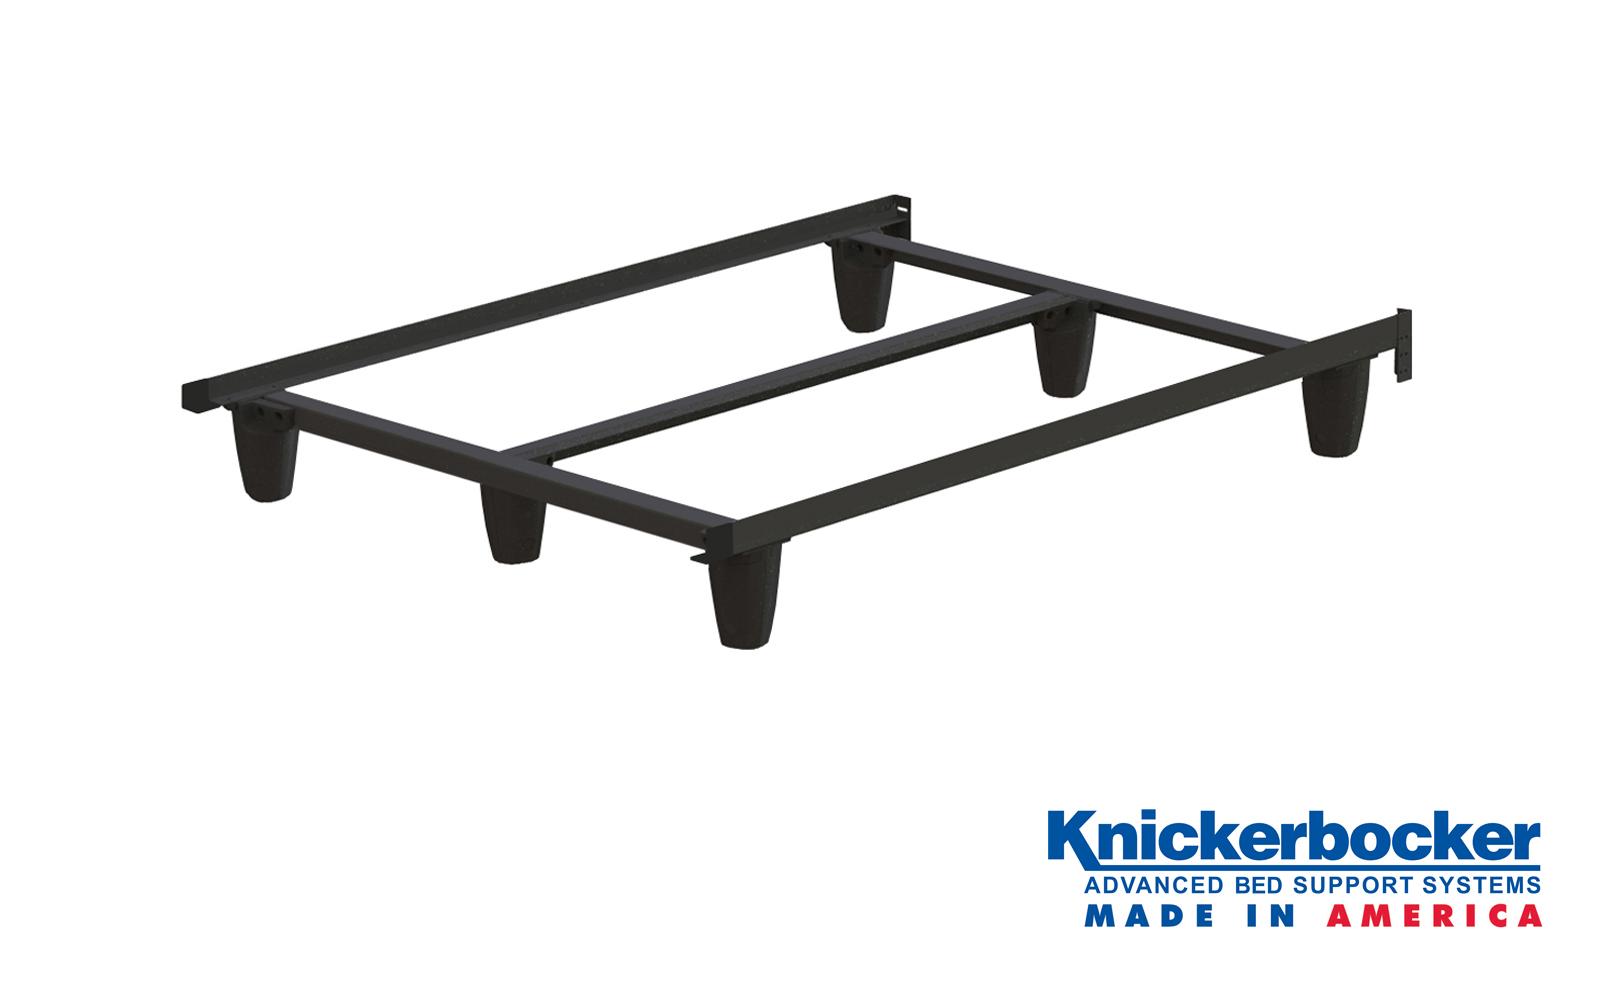 Full Engauge Hybrid Bed Frame Knickerbocker Bed Frame